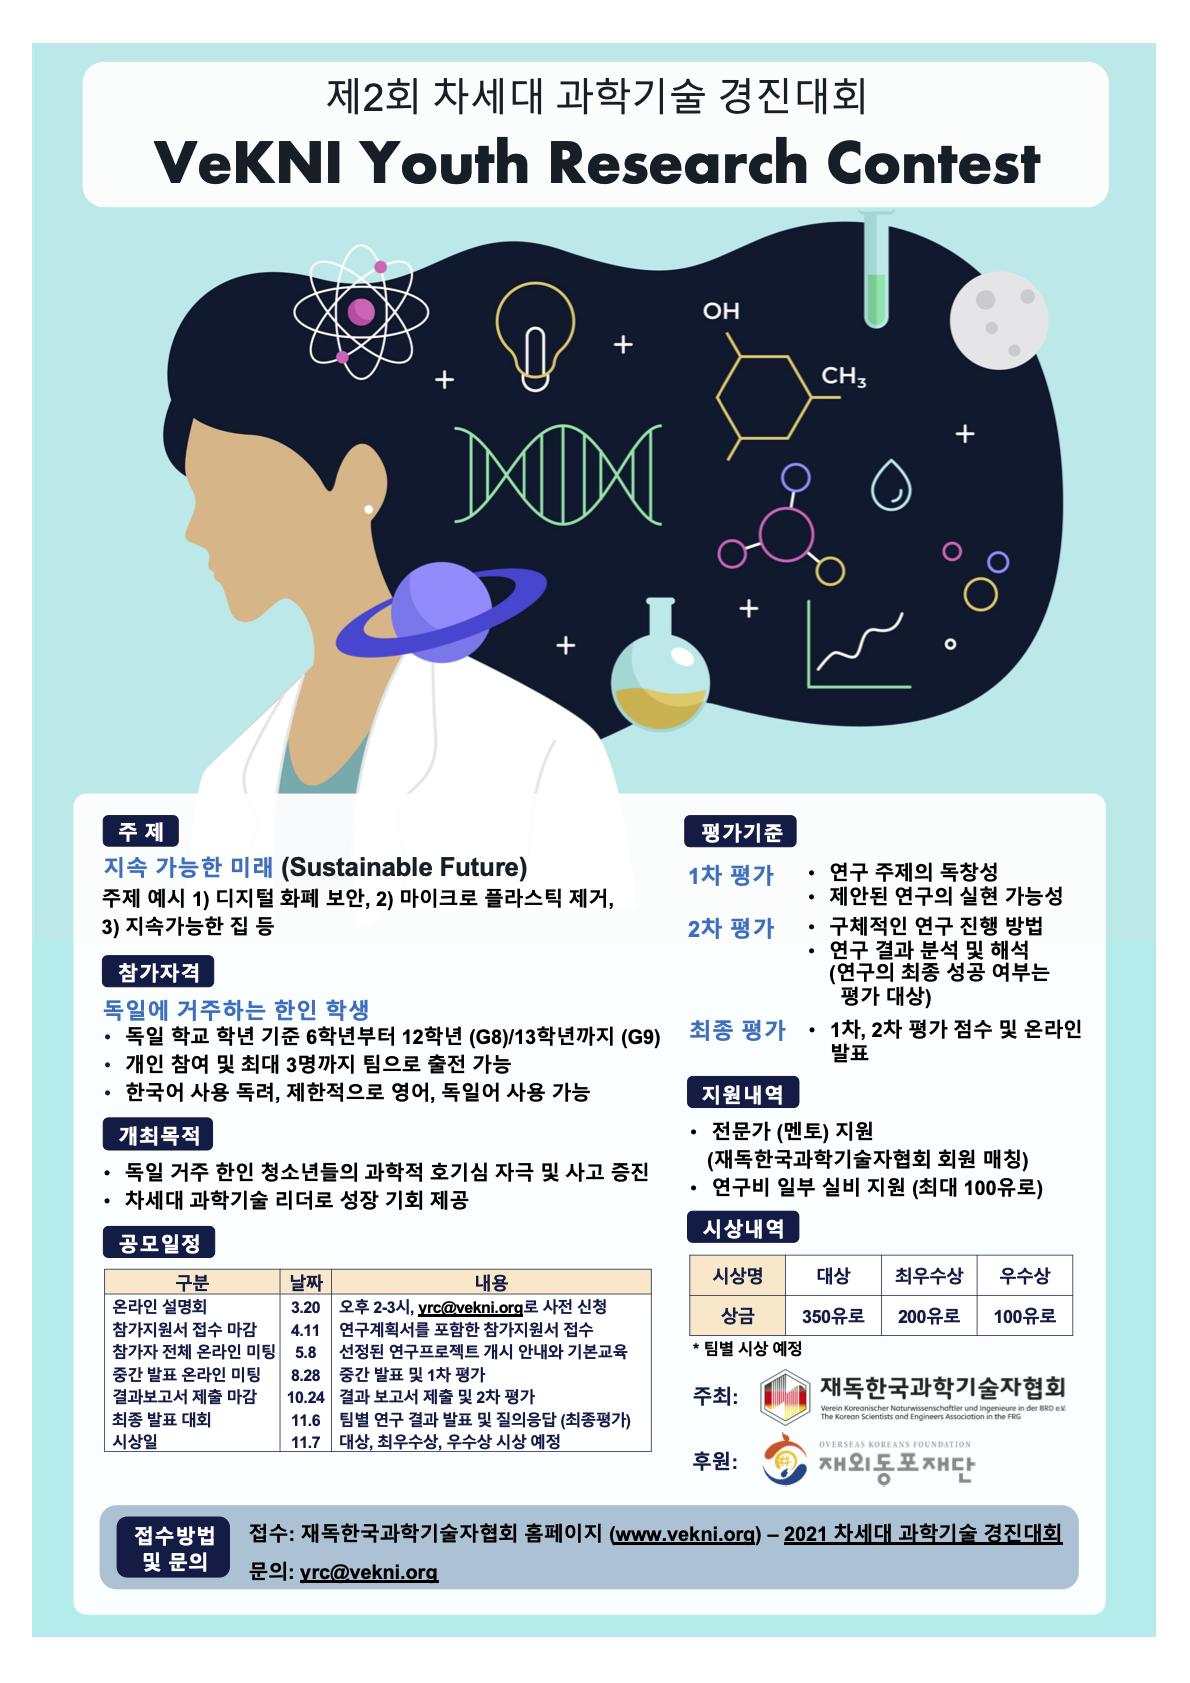 VeKNI_과학경진대회_2021_포스터1.png